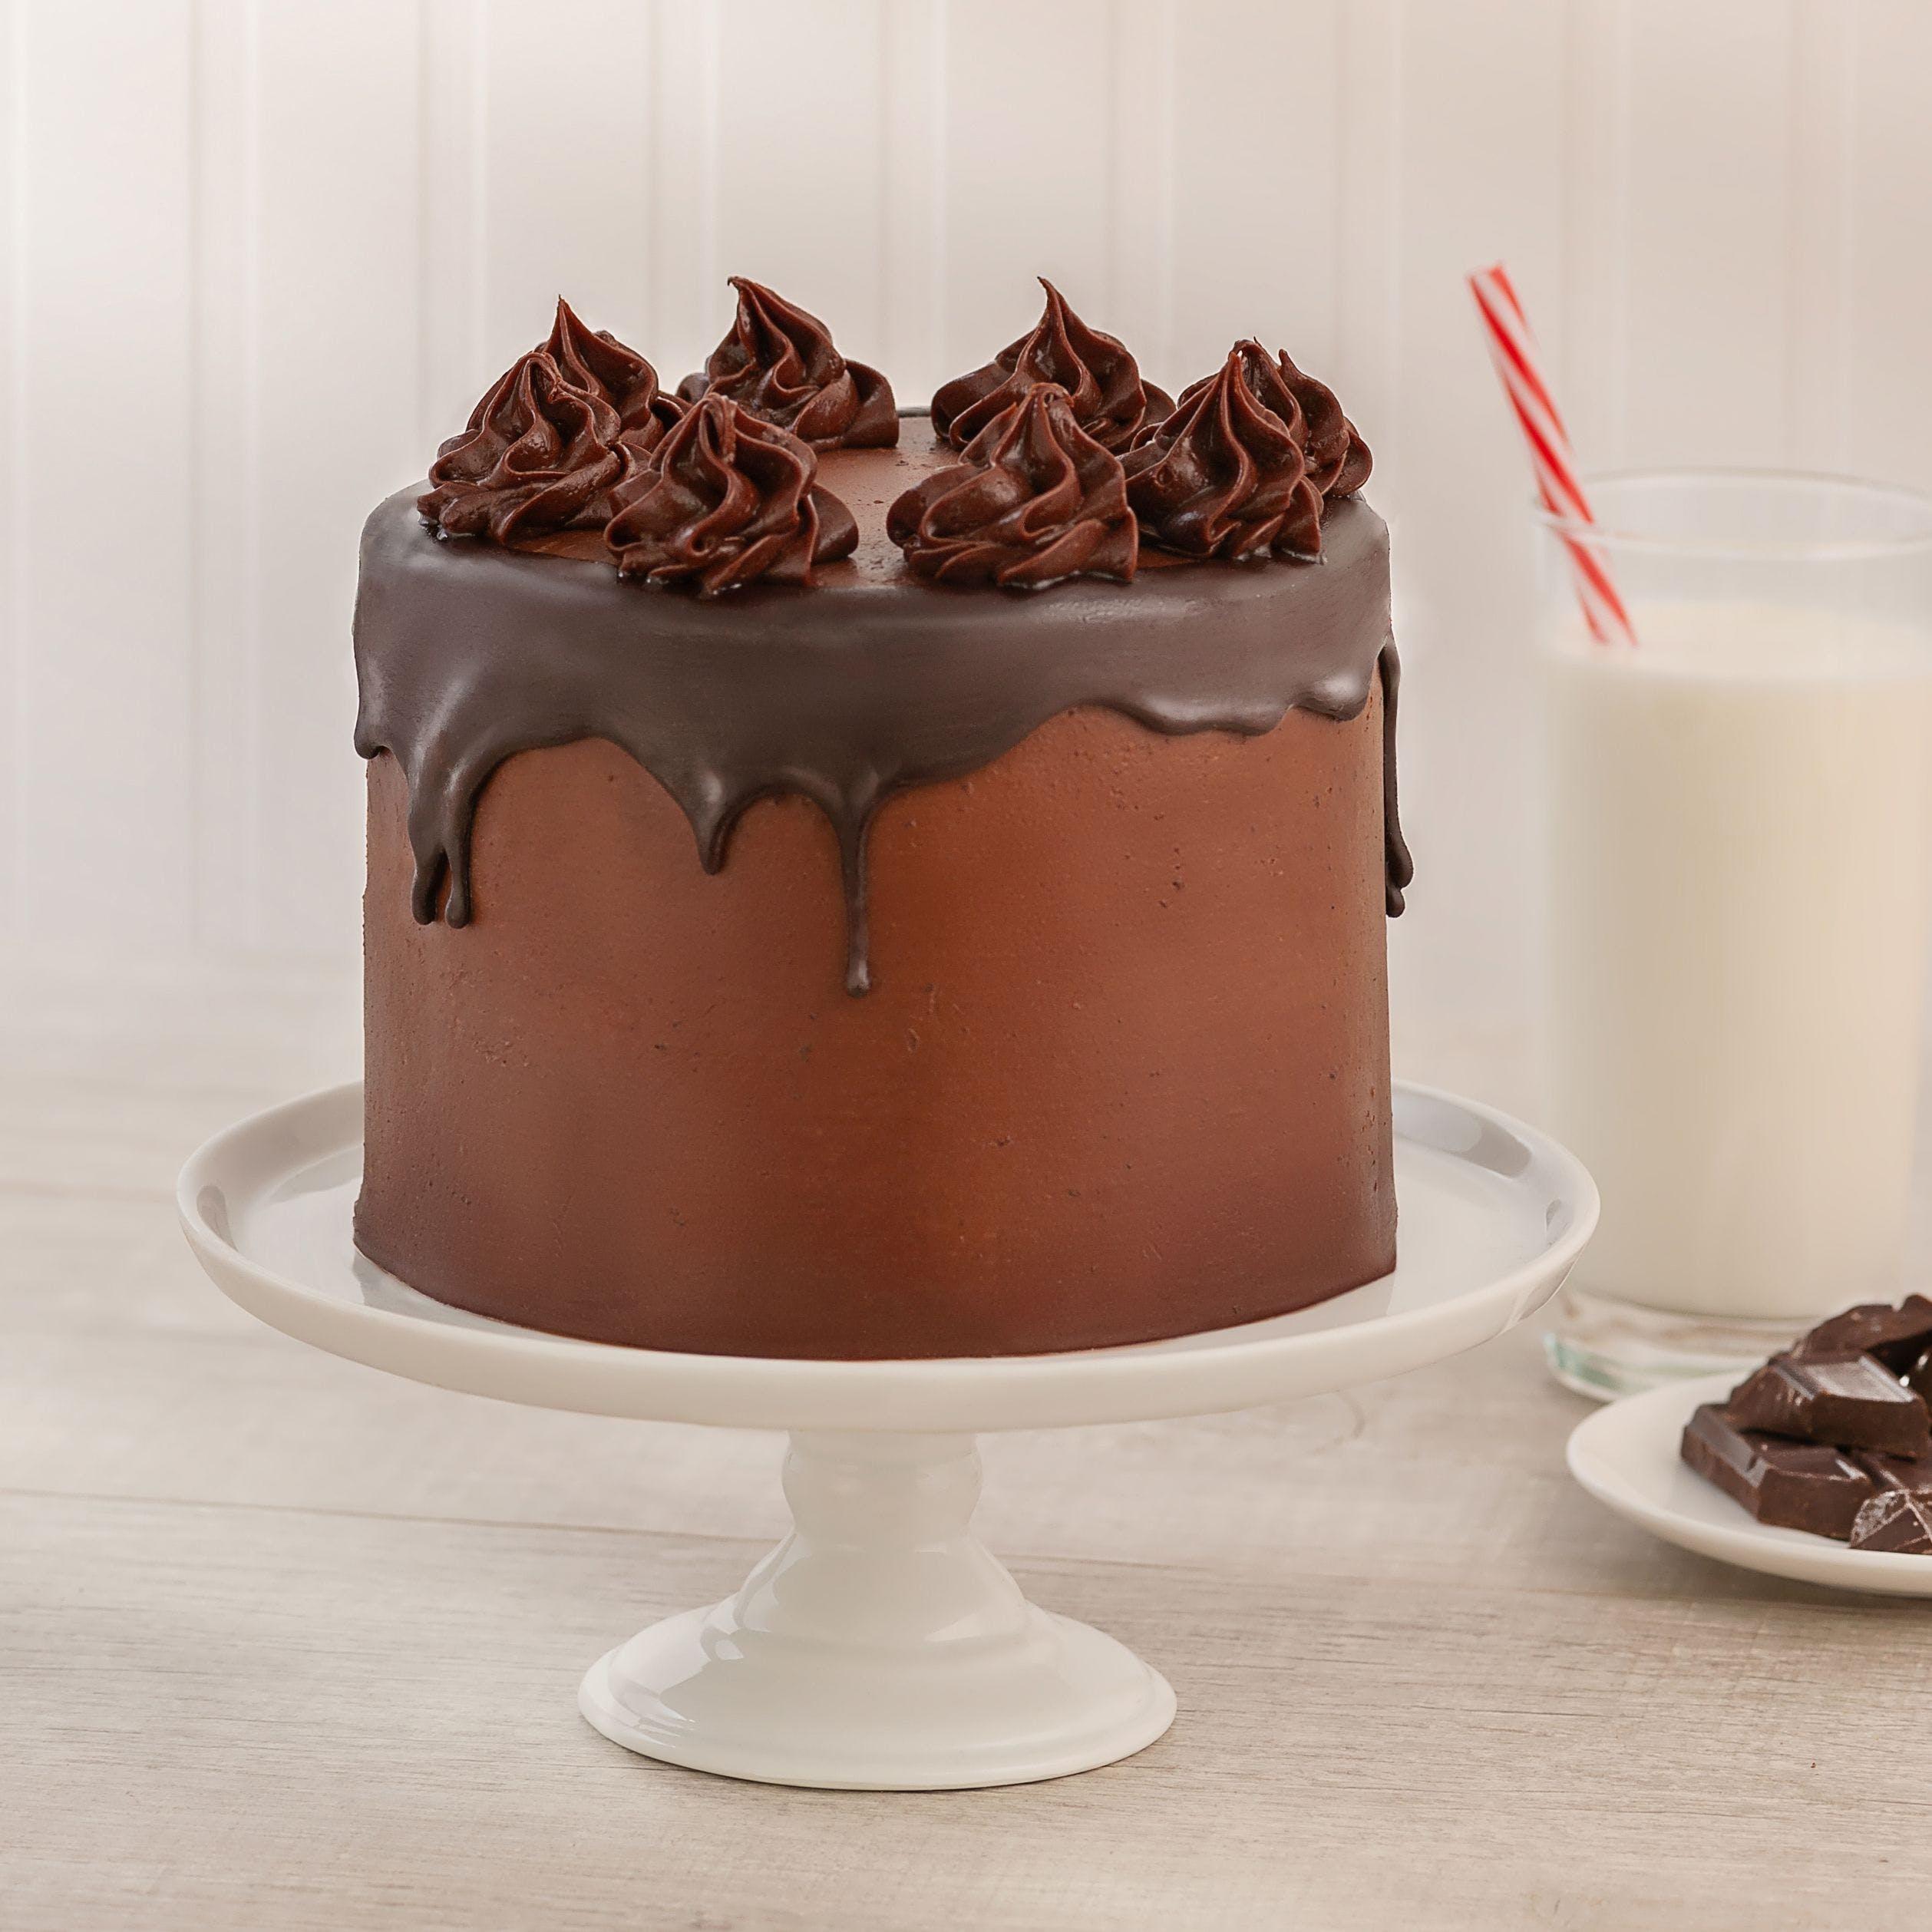 Award Winning Chocolate 4 Layer Cake By We Take The Cake Goldbelly